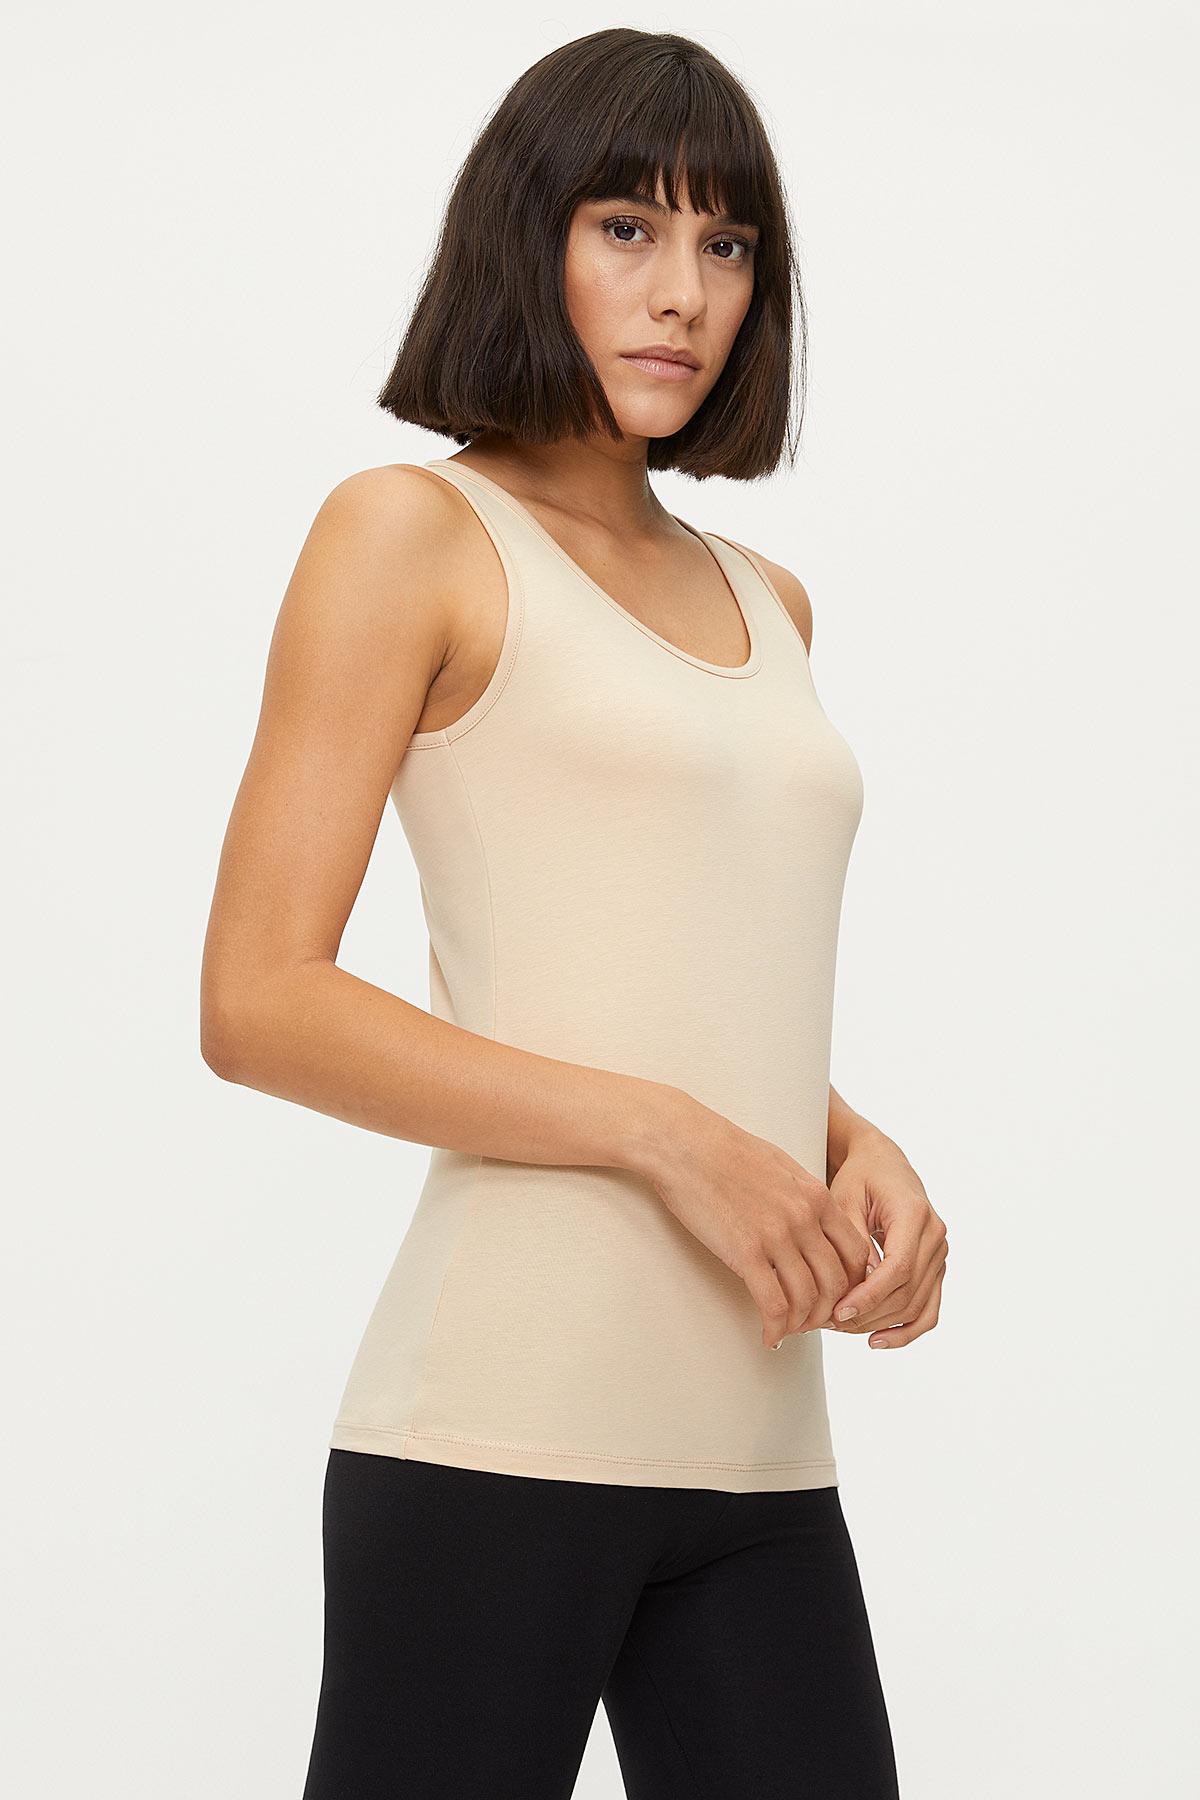 1247 Lycra Wide Strappy Women's Undershirt - Thumbnail